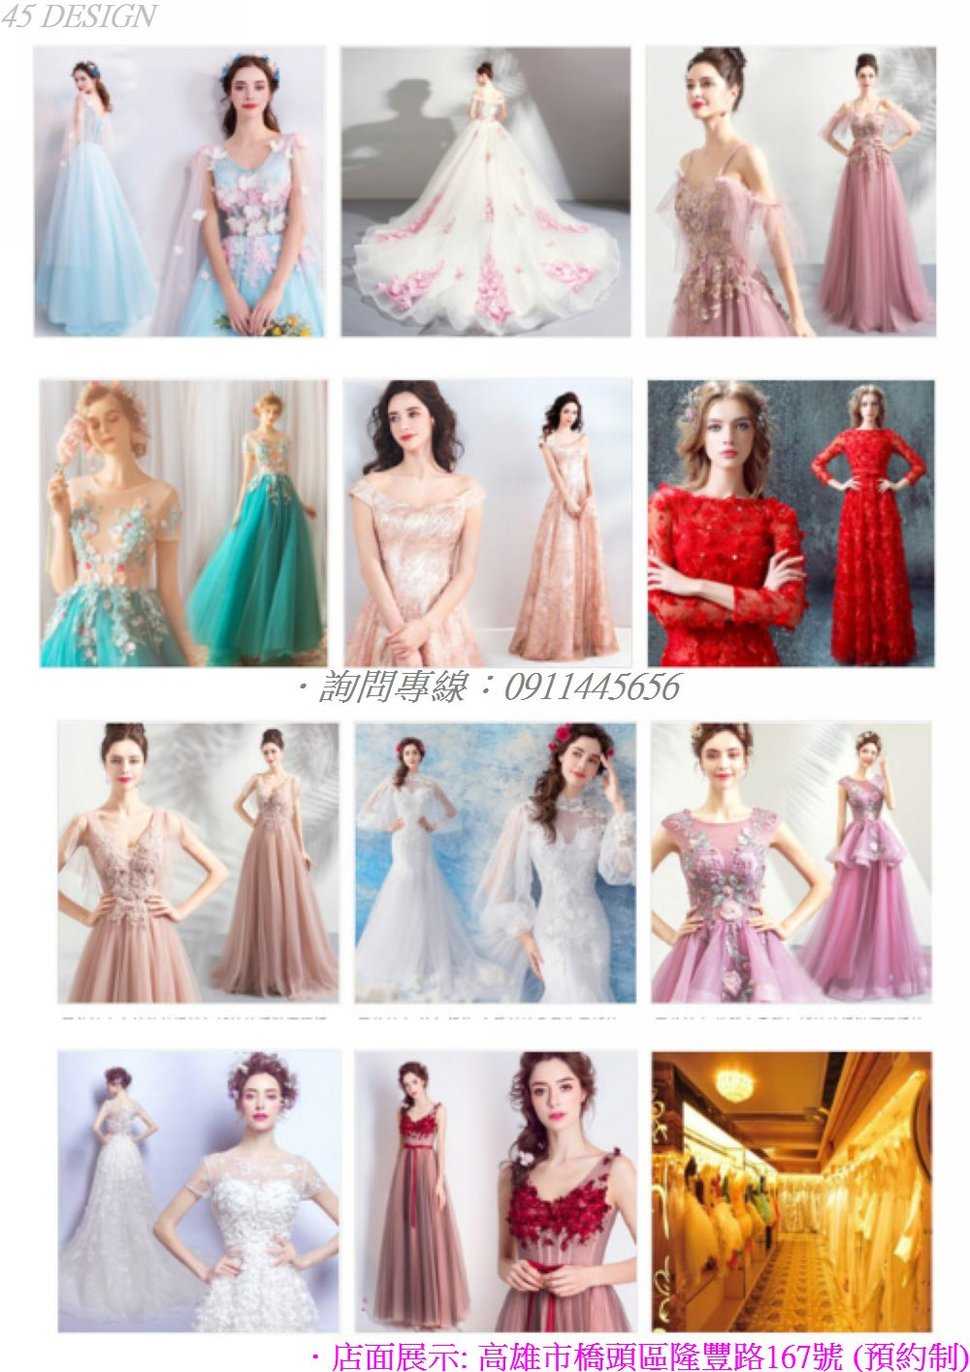 msl190815428C2452642441519E037F6727EF607D - 全台最便宜-45DESIGN四五婚紗禮服《結婚吧》